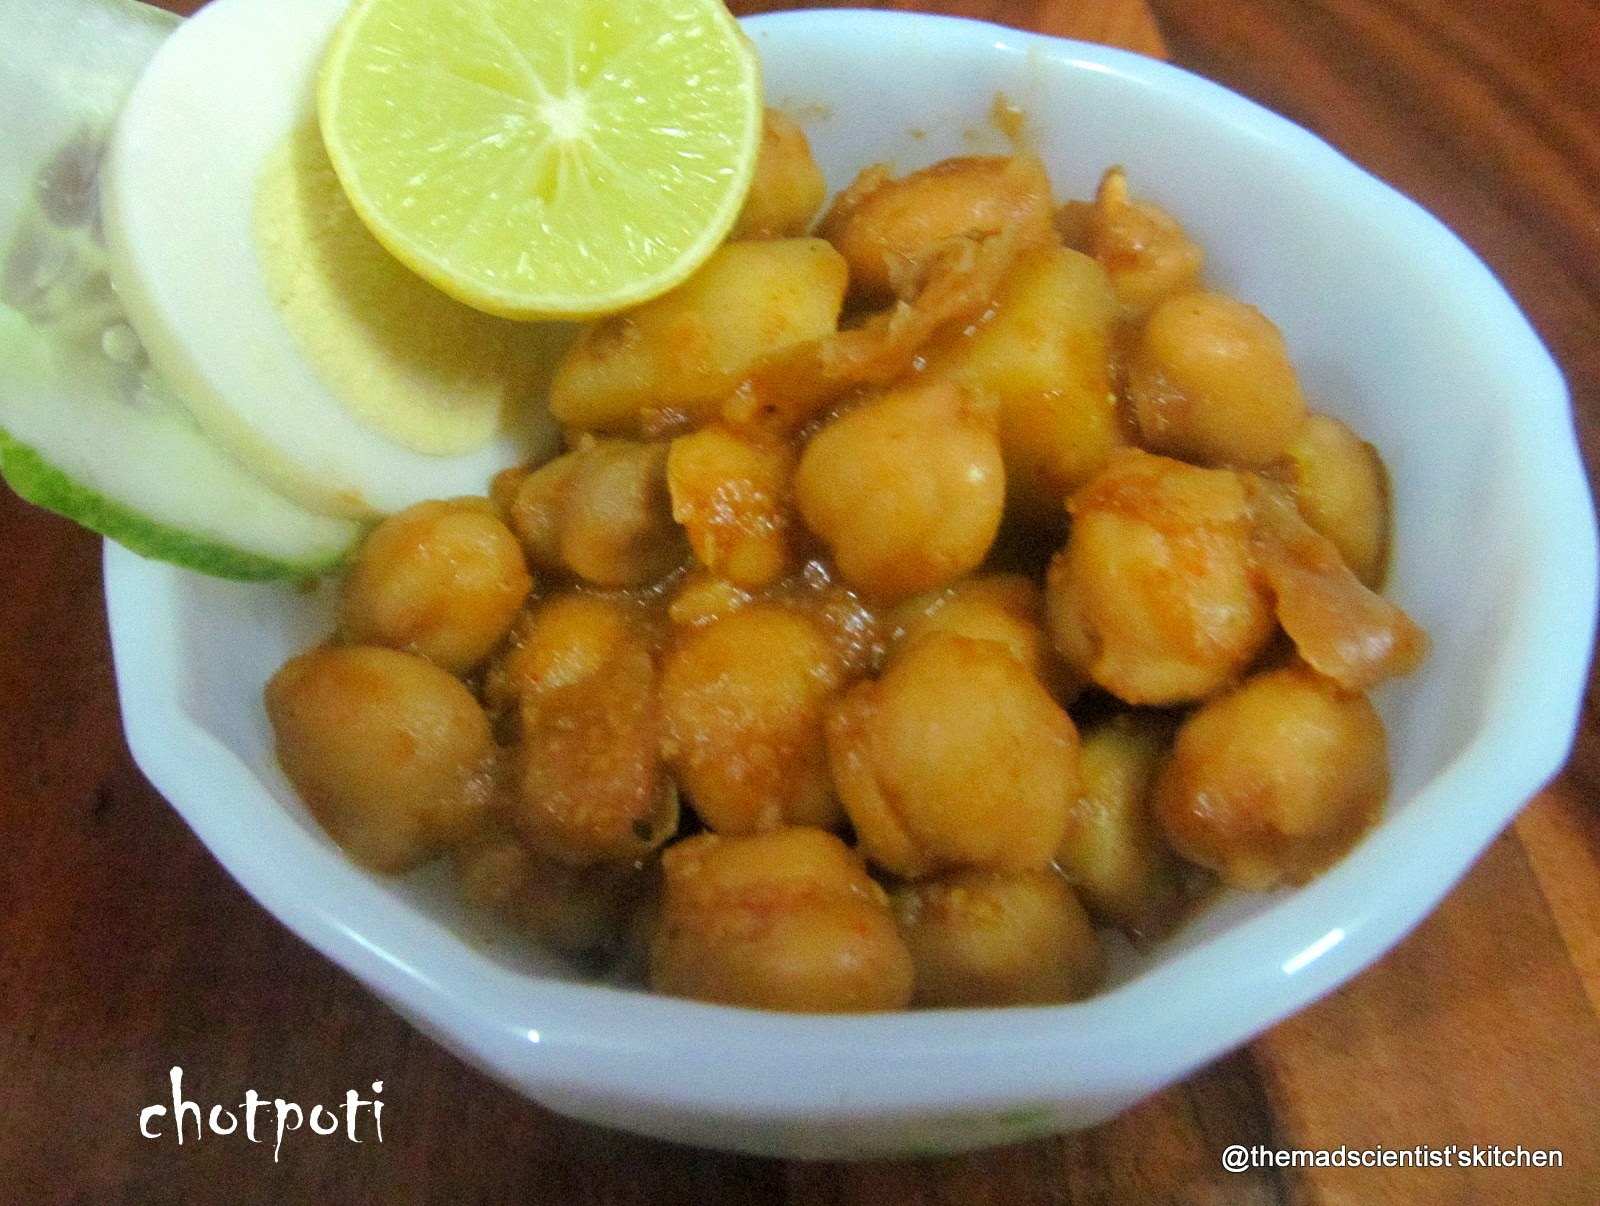 Chotpotia tangy chaat from bangladesh chotpoti cuisine bangaladesh forumfinder Images